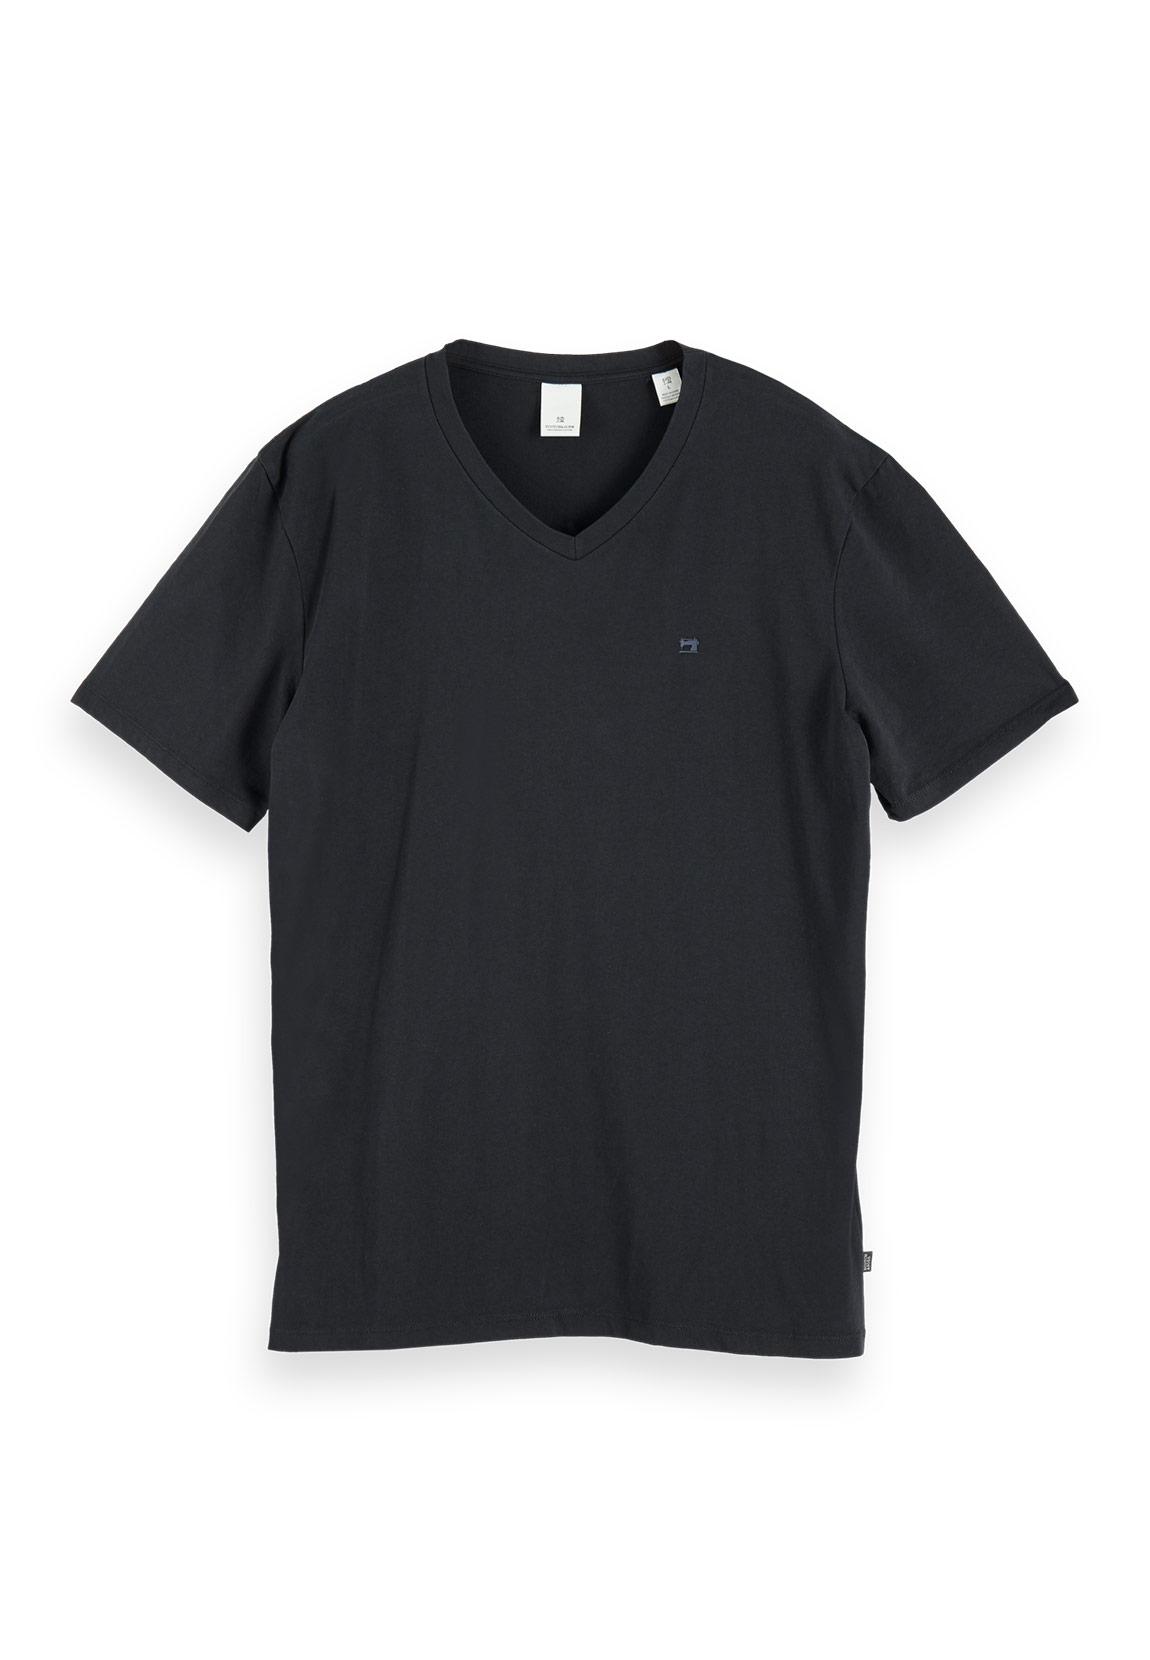 Scotch /& Soda T-Shirt Herren NOS COTTON ELASTANE V-NECK TEE 155896 Schwarz 90